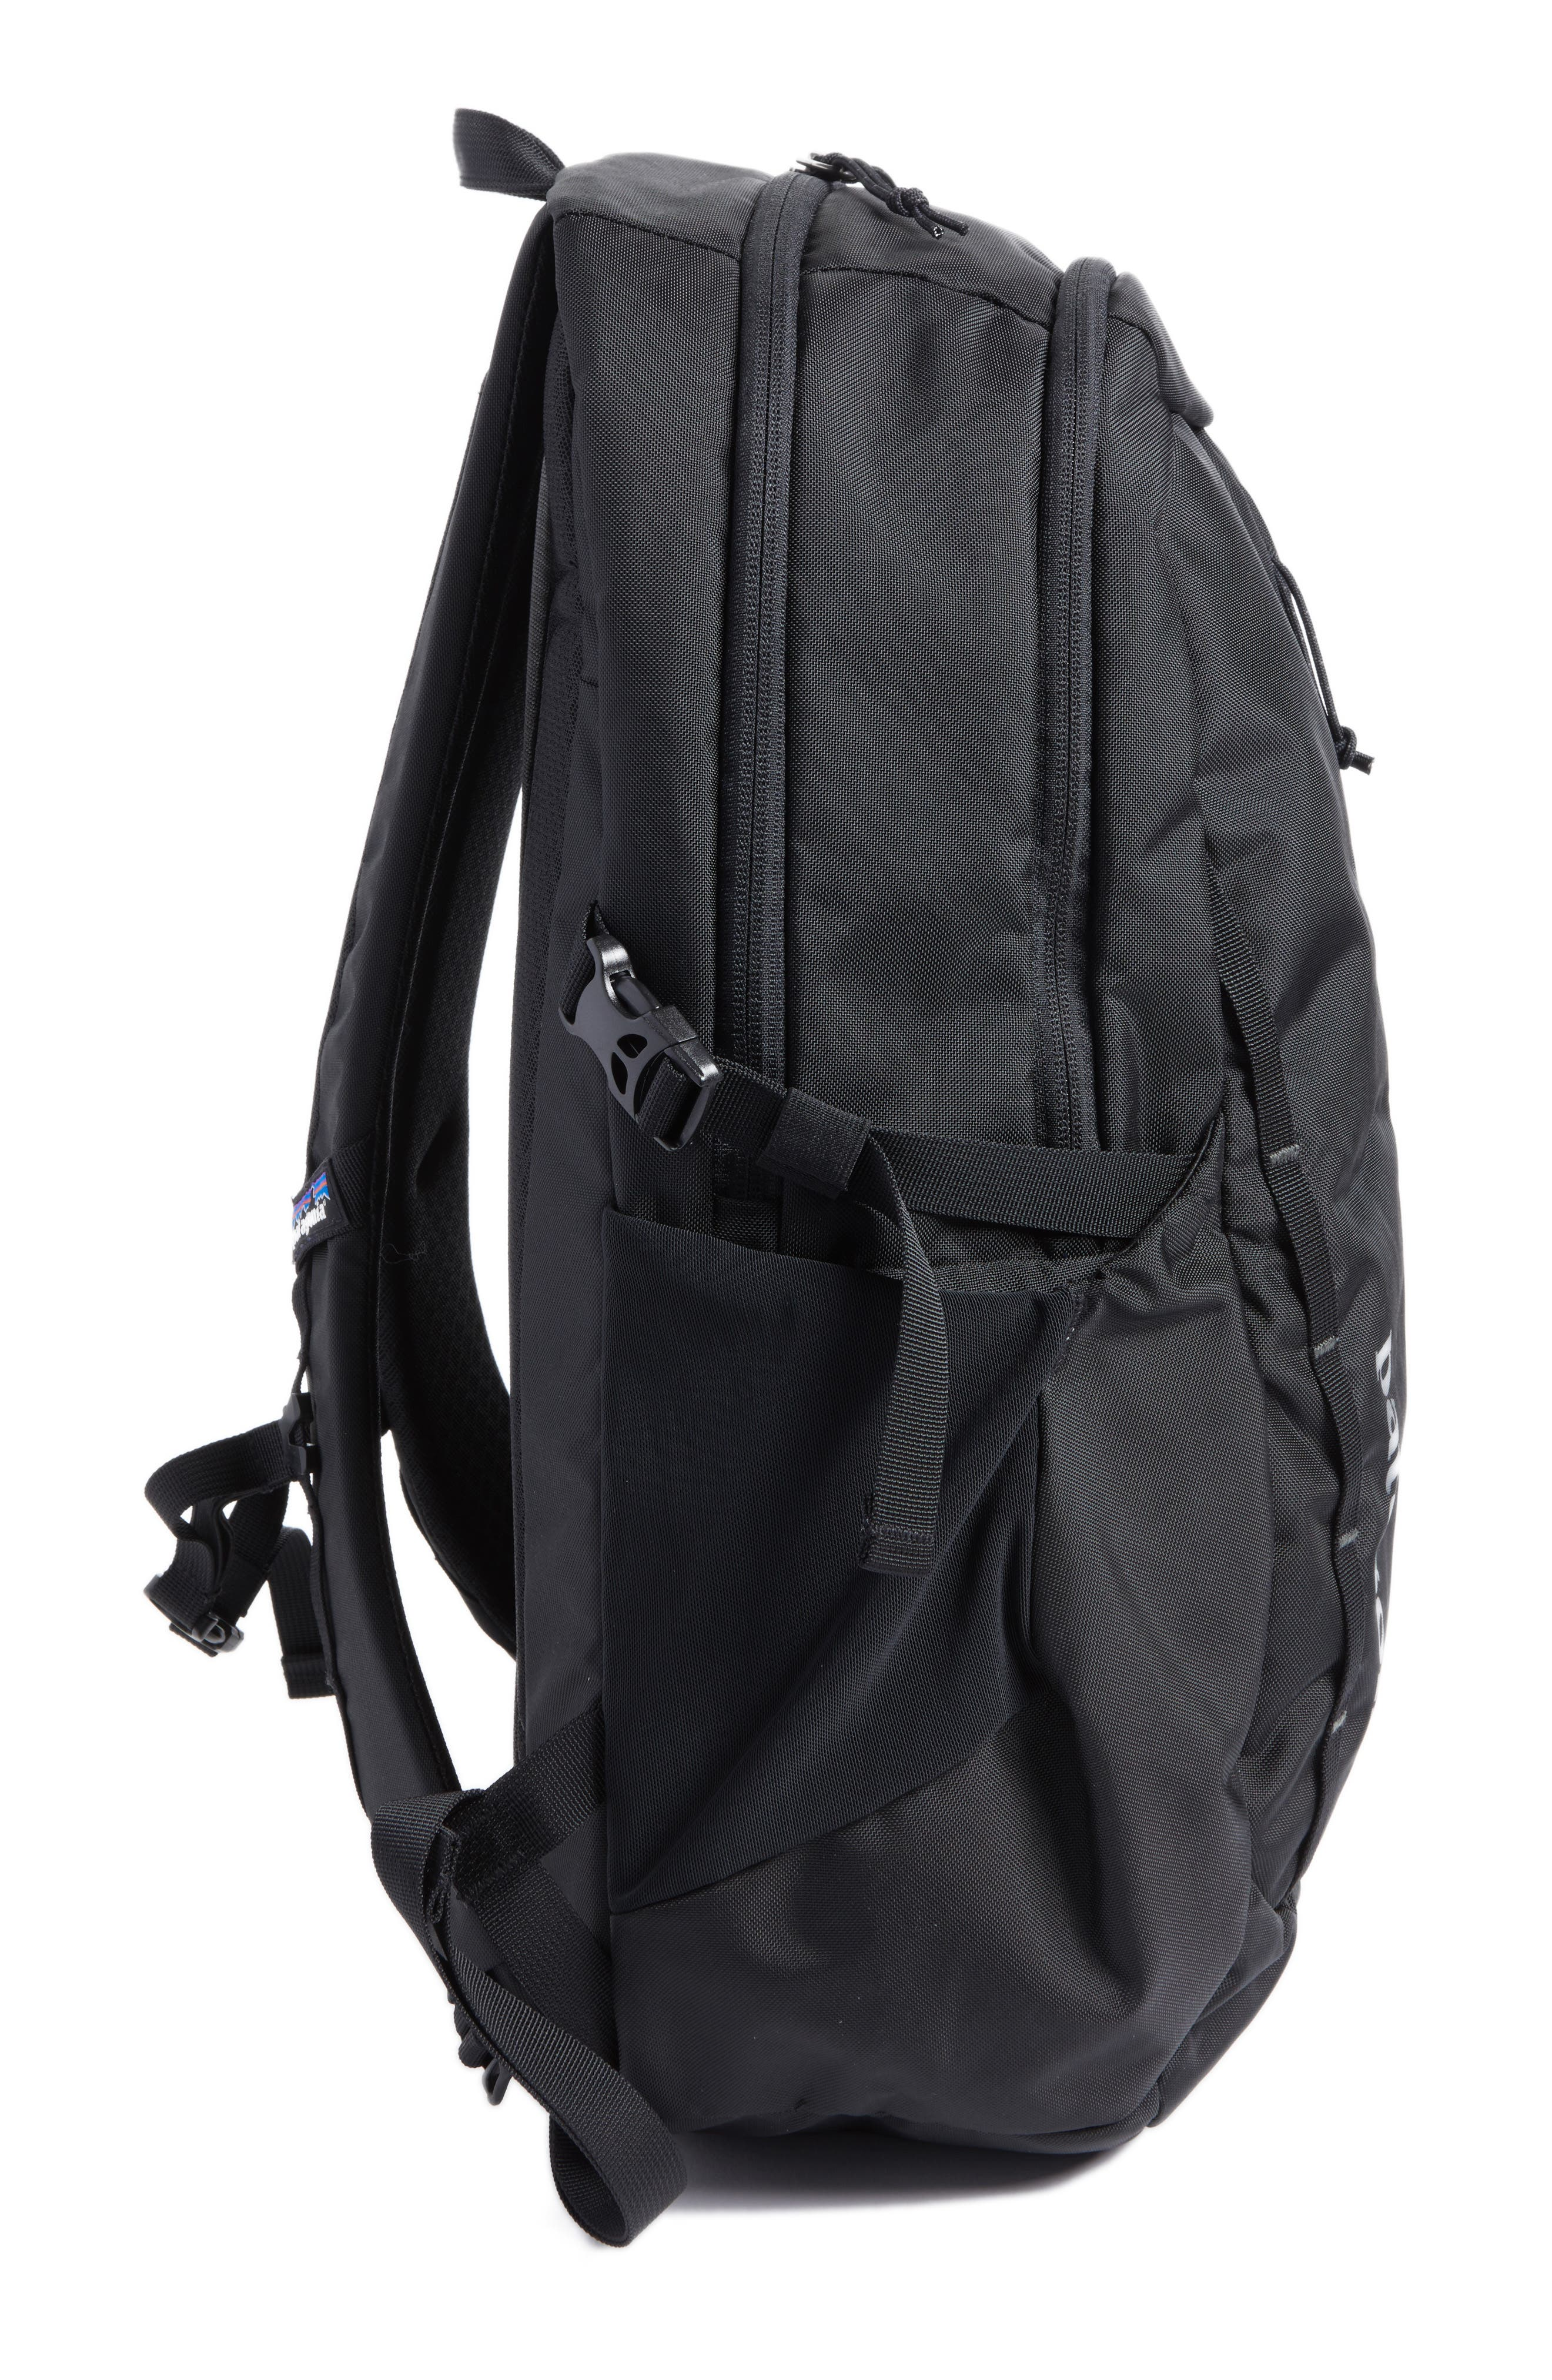 PATAGONIA, Refugio 26L Backpack, Alternate thumbnail 6, color, BLACK